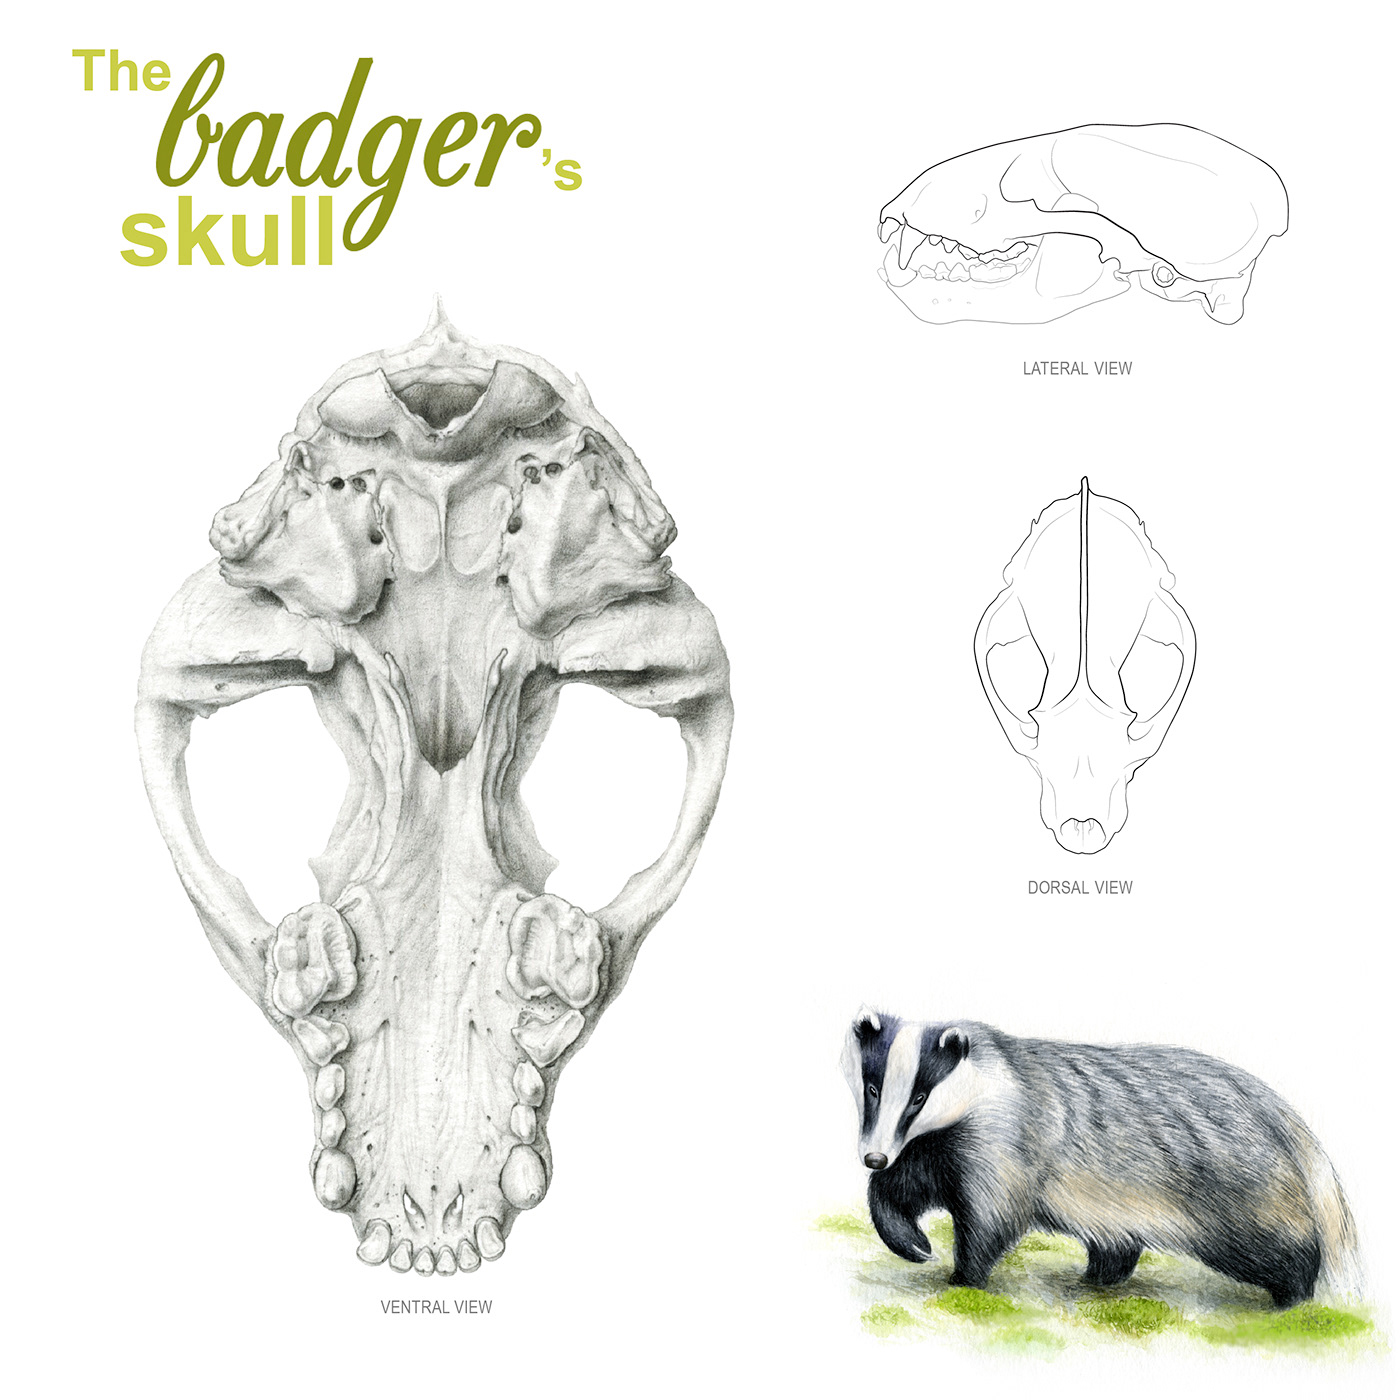 scientific illustration nature illustration badger skull graphite